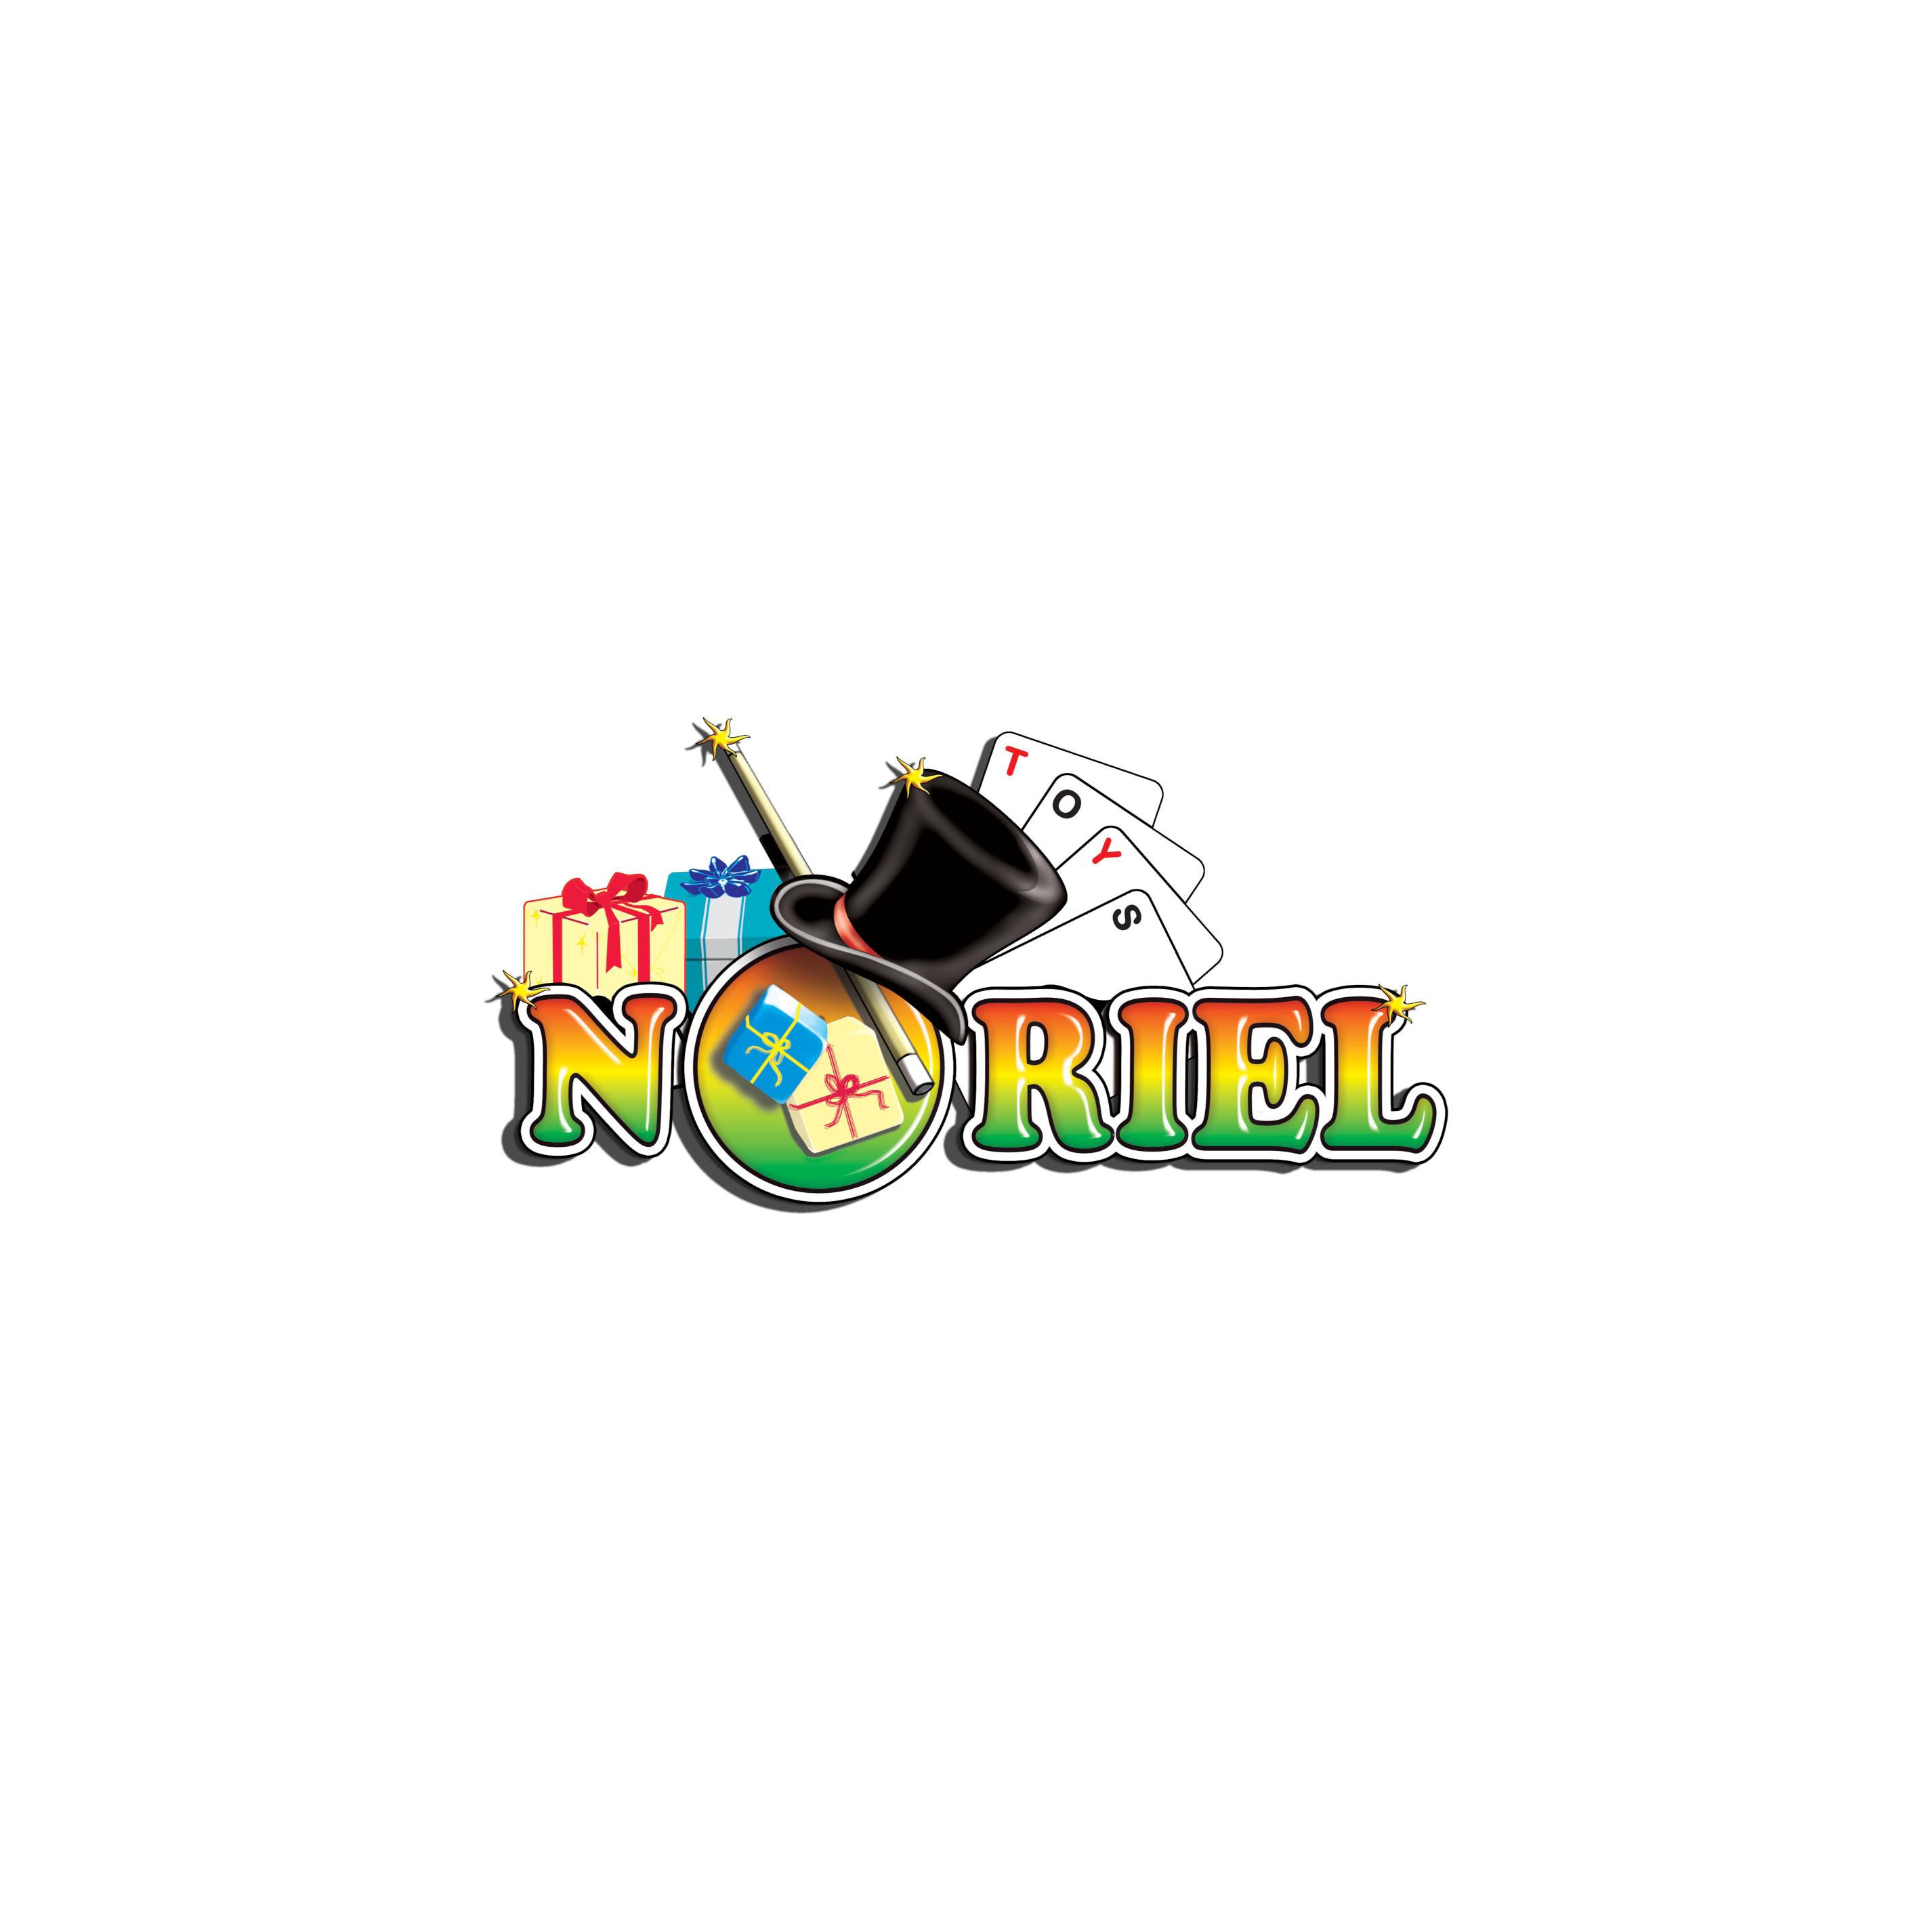 Micul Constructor - La circ